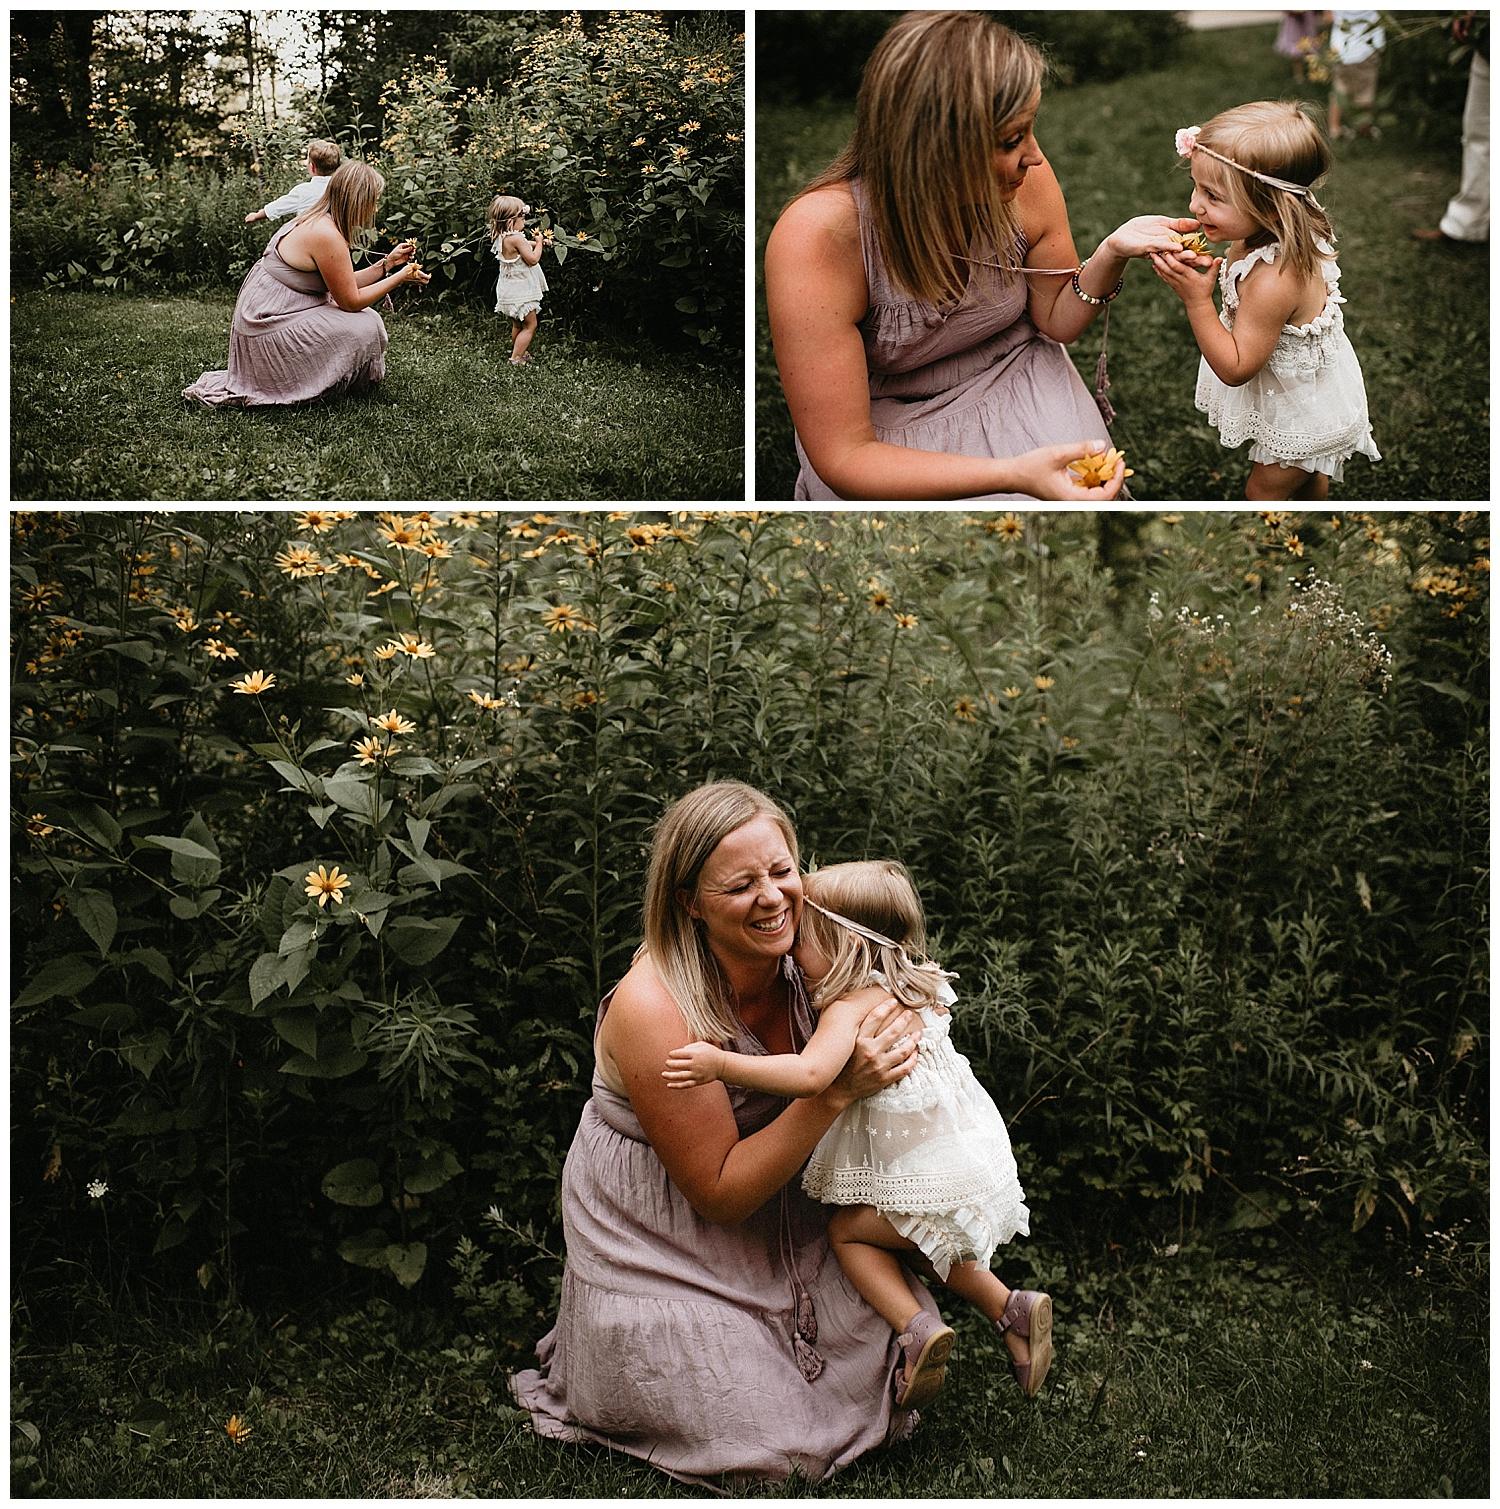 NEPA-Family-Photographer-in-Wilkes-Barre-PA_0152.jpg